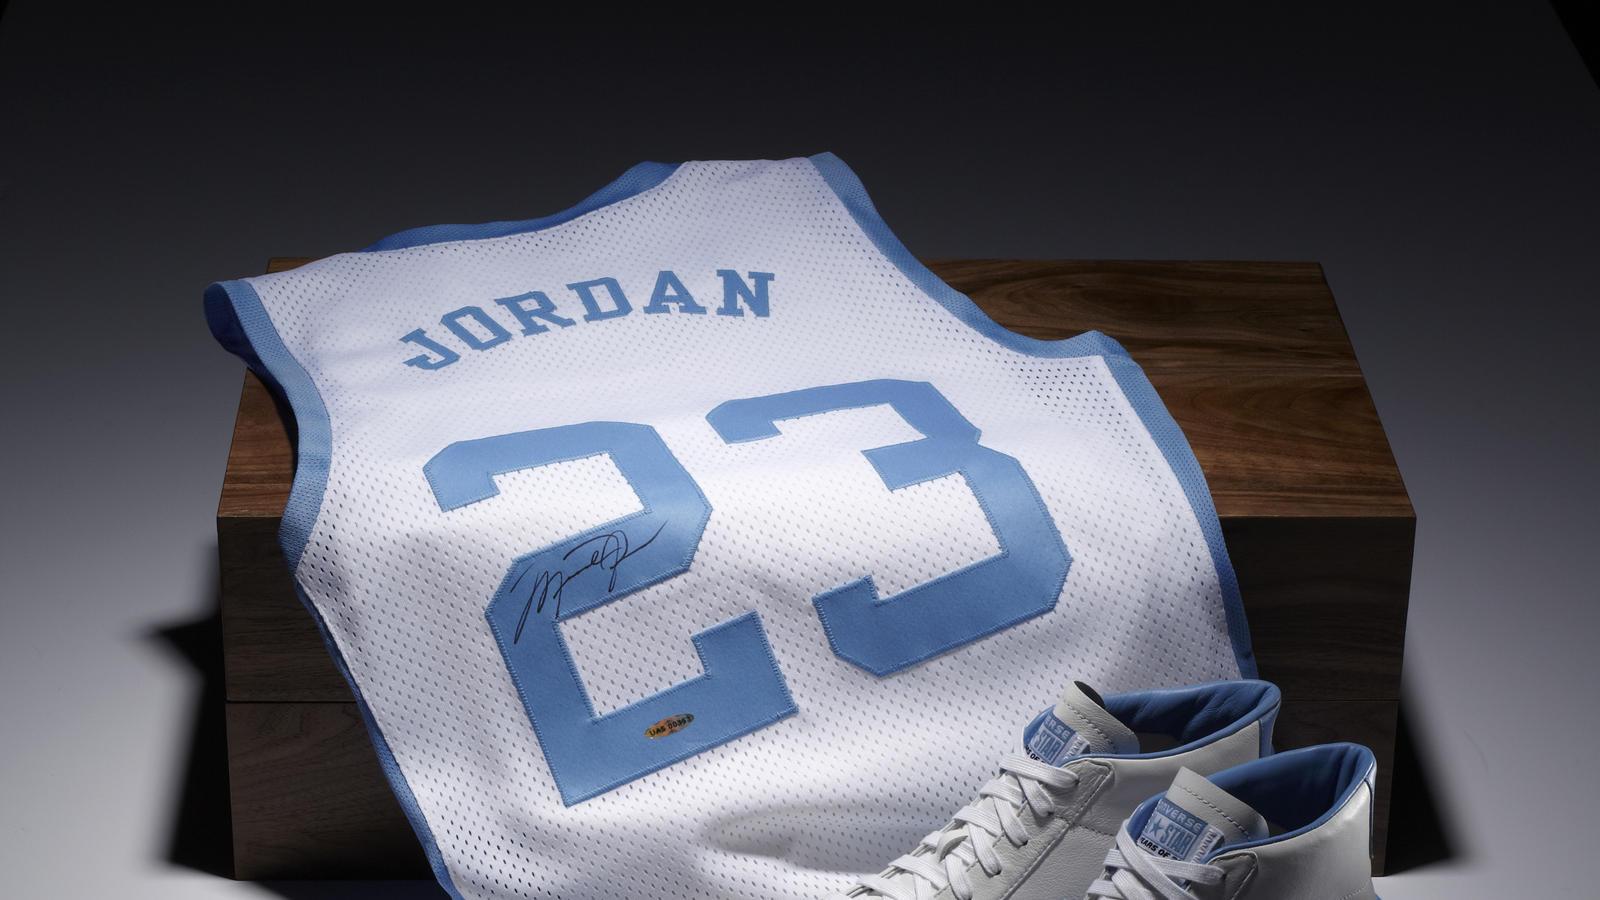 Converse, the Nike brand